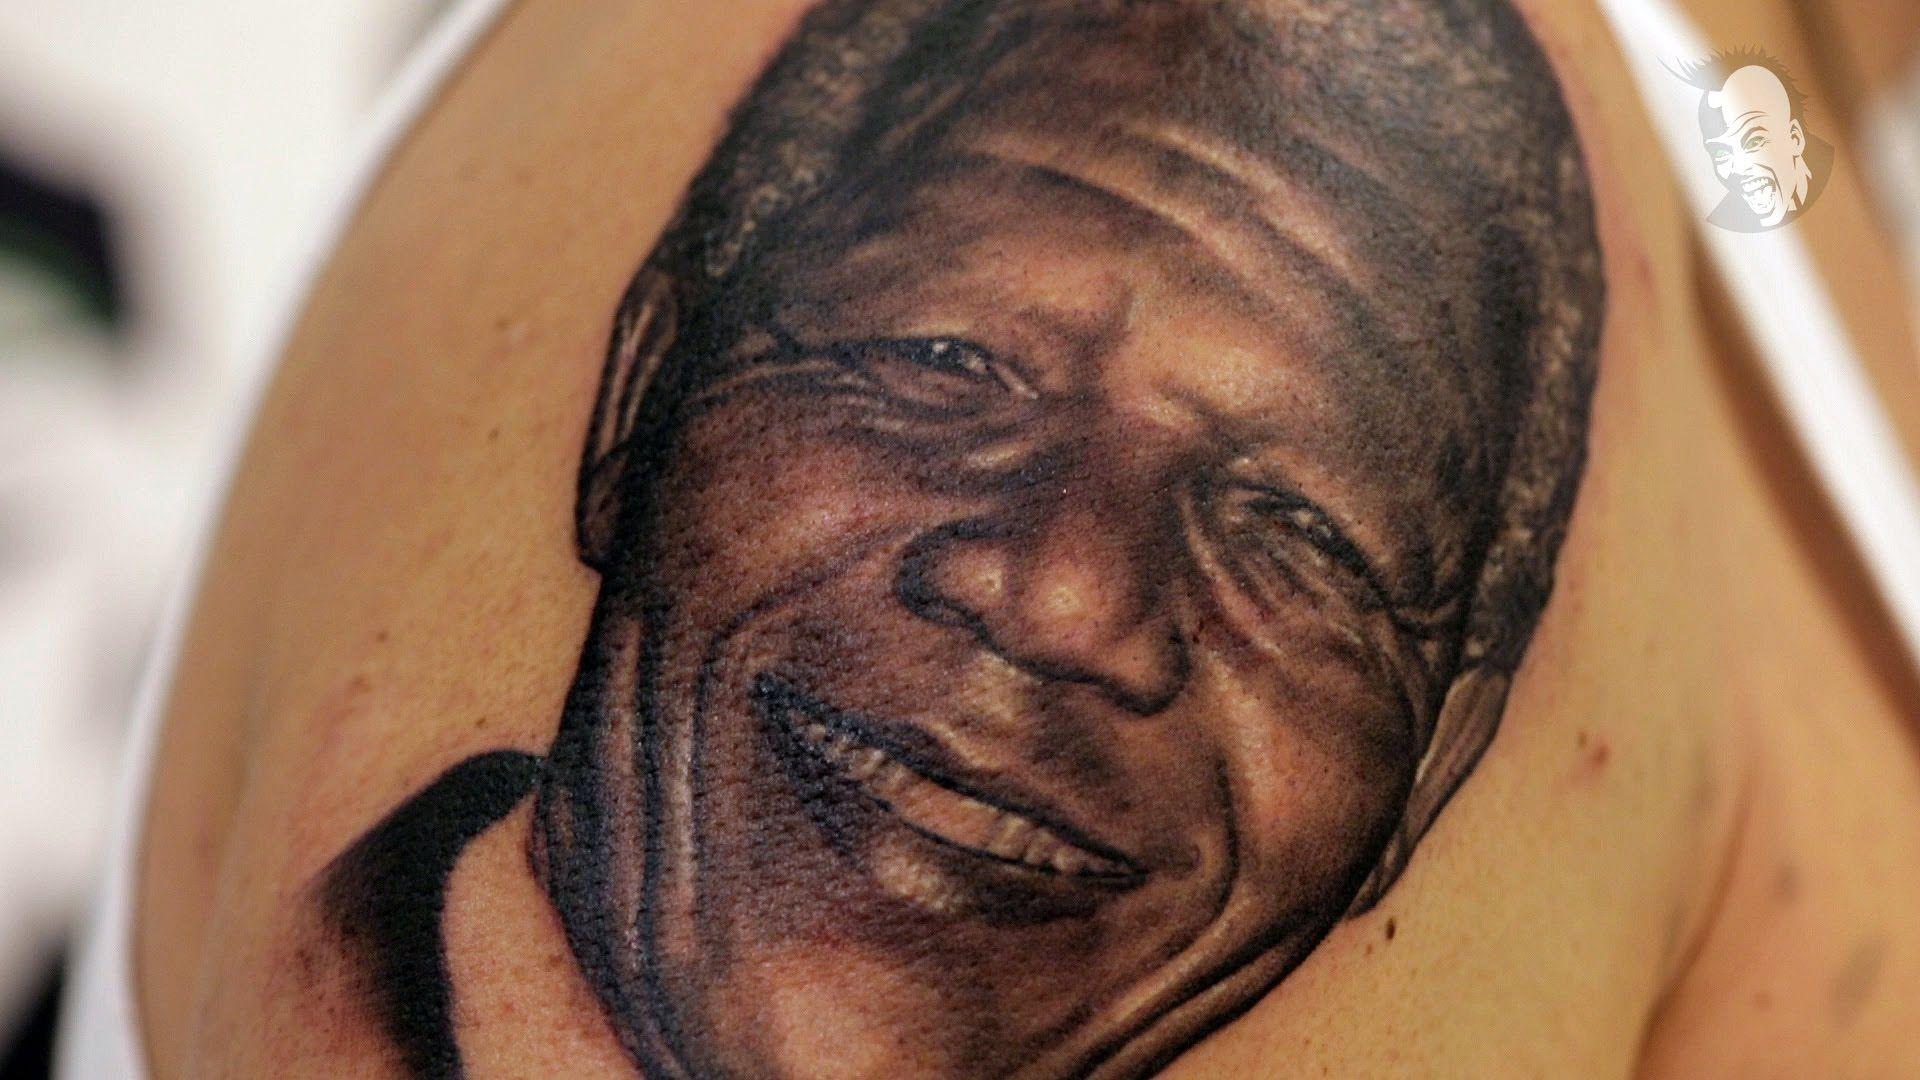 InkMe TV Folge 5 - Woon Kim - Nelson Mandela Tattoo Portrait - YouTube